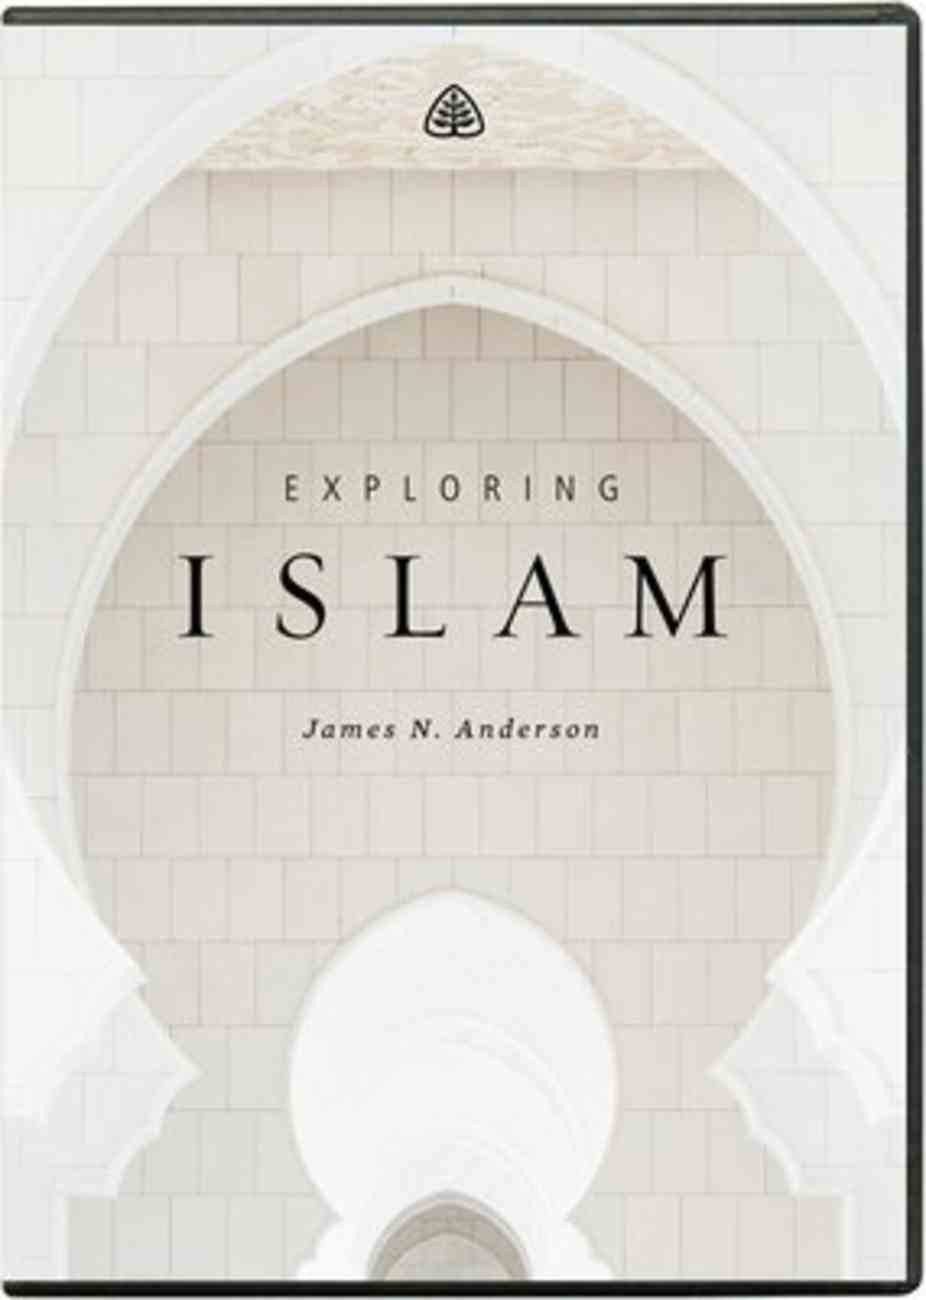 Explording Islam (2 Dvds) DVD